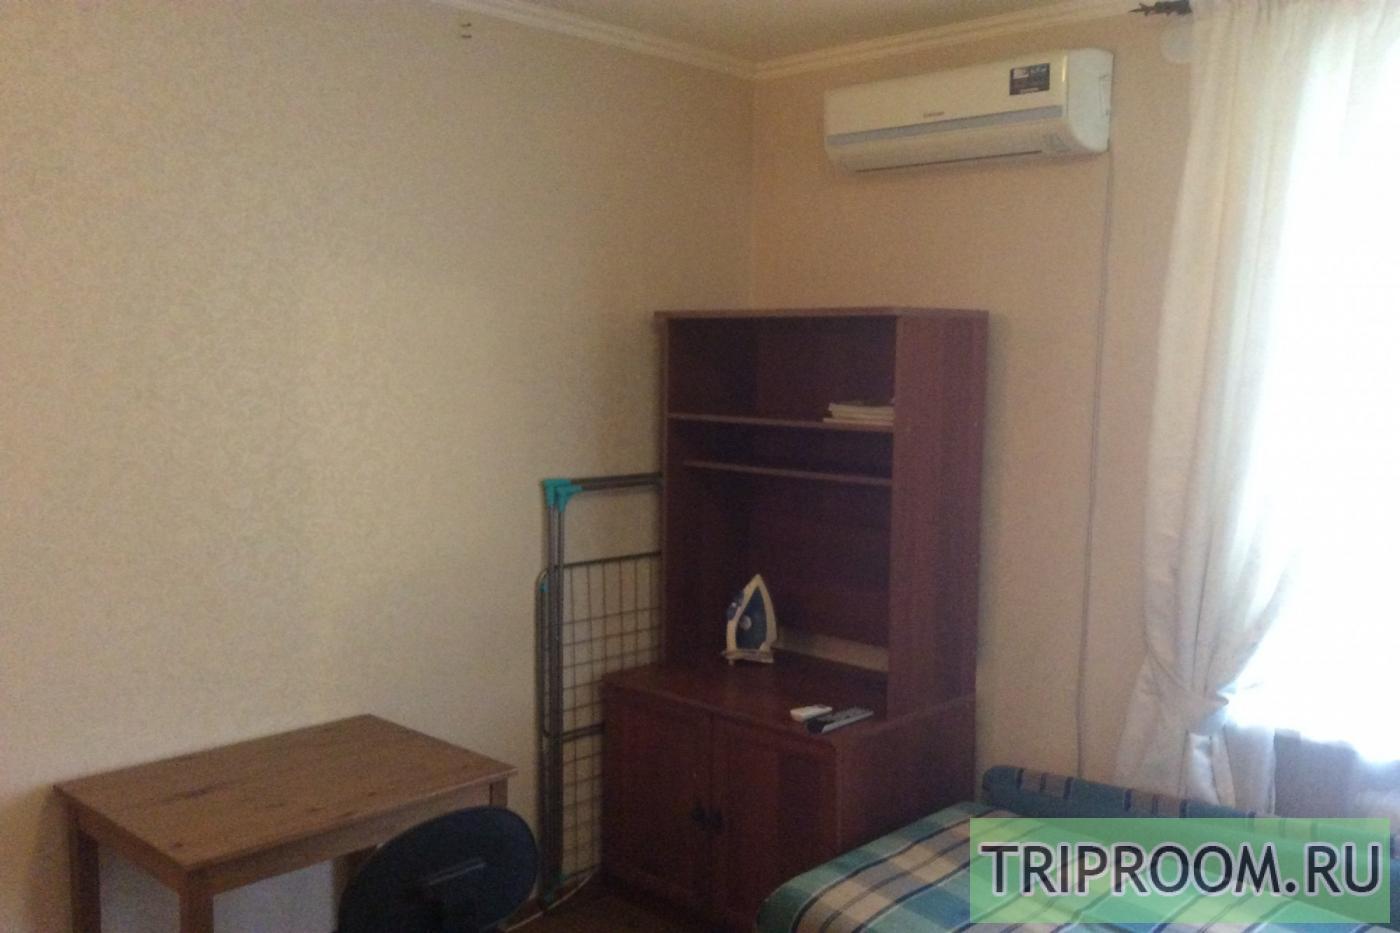 2-комнатная квартира посуточно (вариант № 23910), ул. М. Нагибина проспект, фото № 4